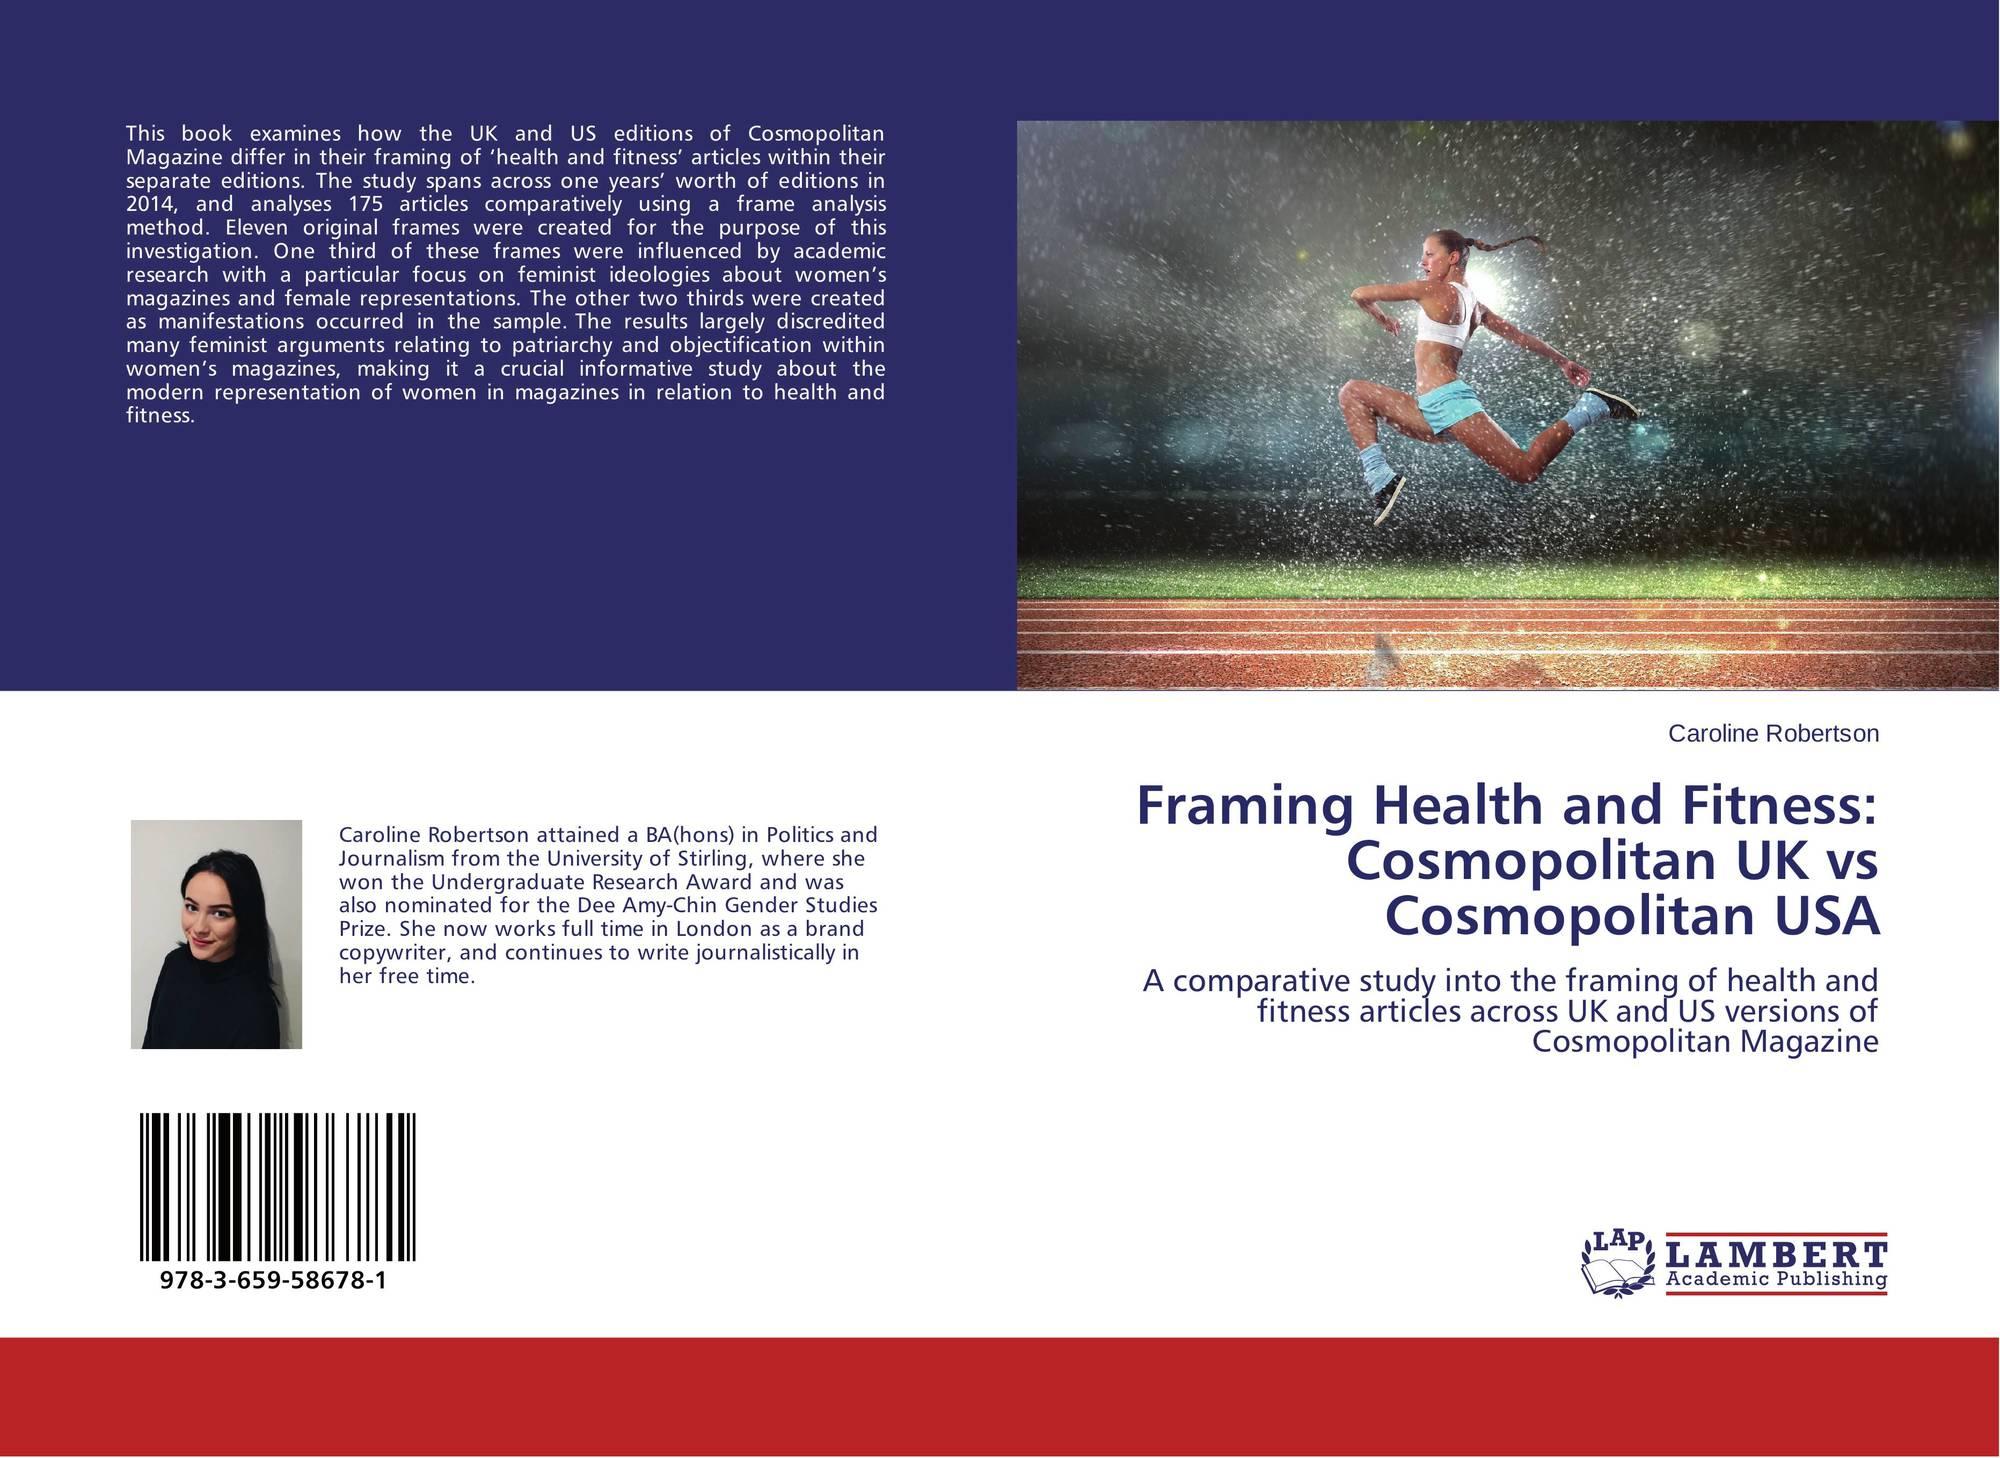 Framing Health and Fitness: Cosmopolitan UK vs Cosmopolitan